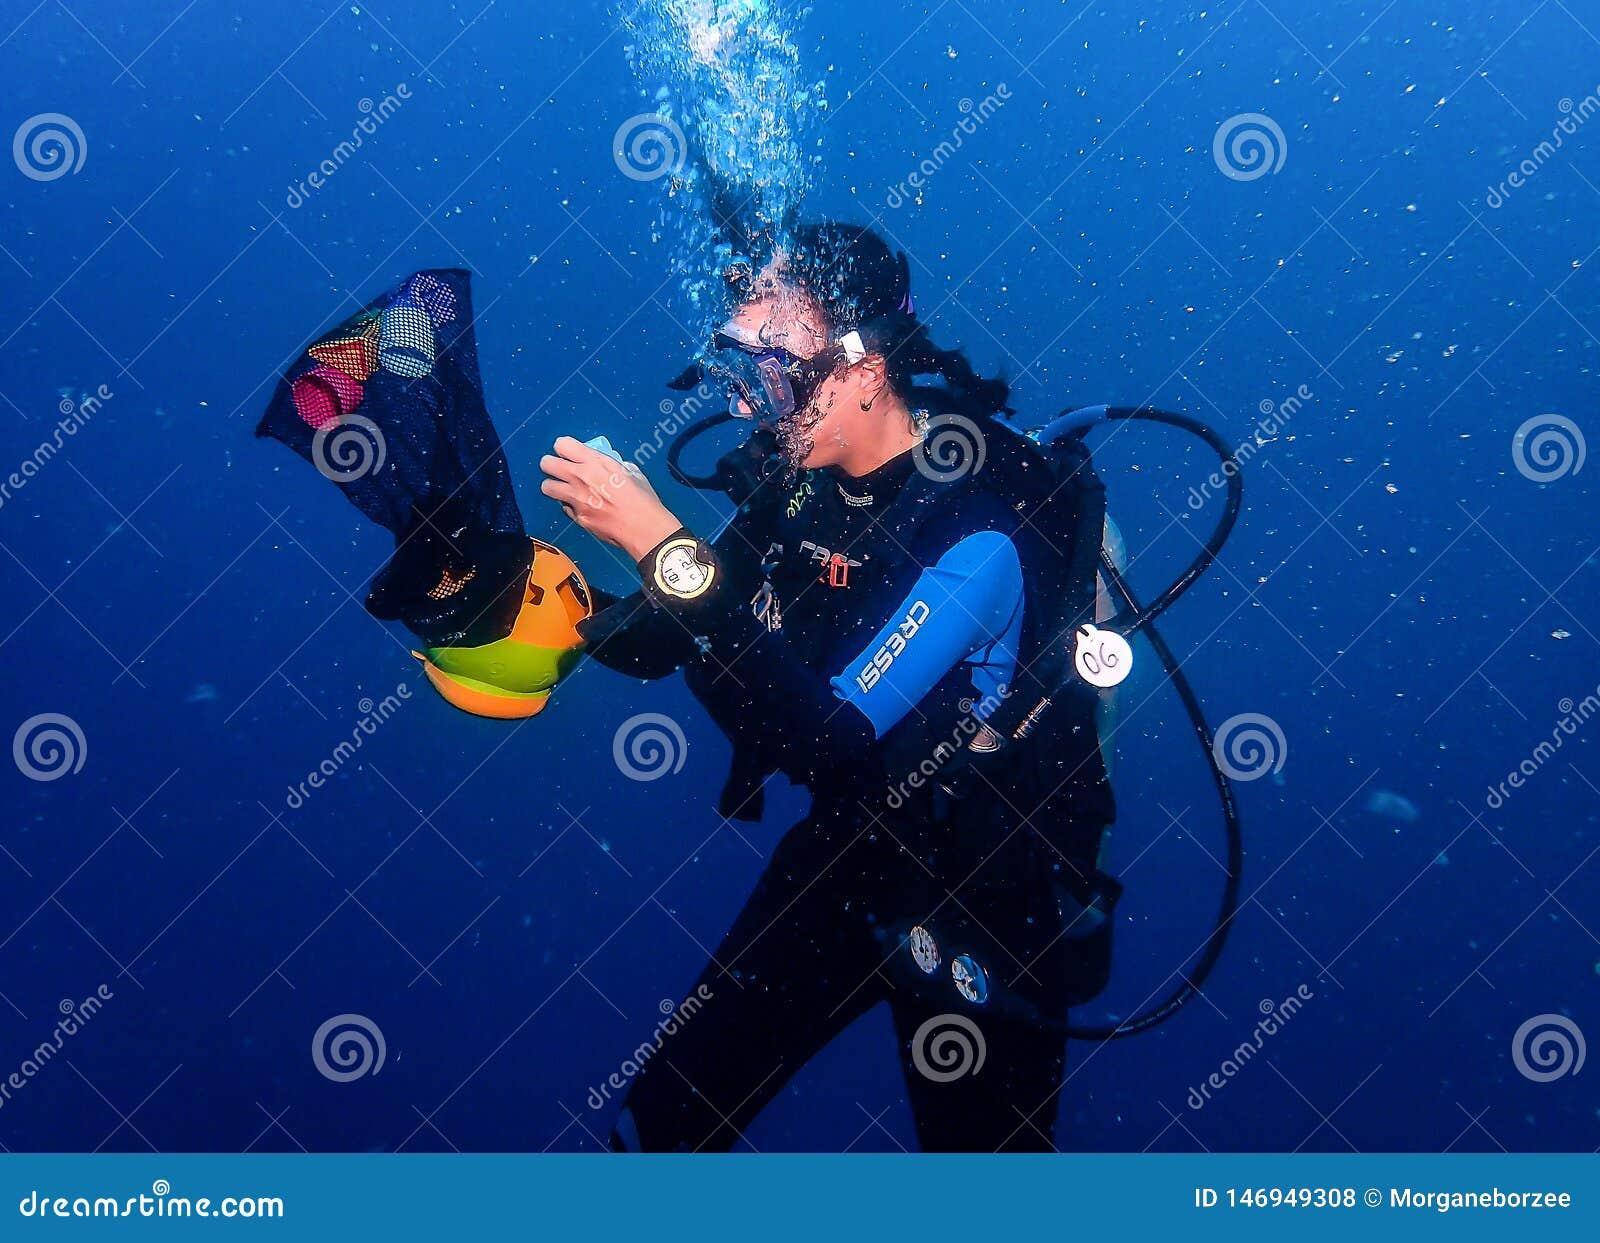 Female scuba diver underwater performing a dexterity exercise